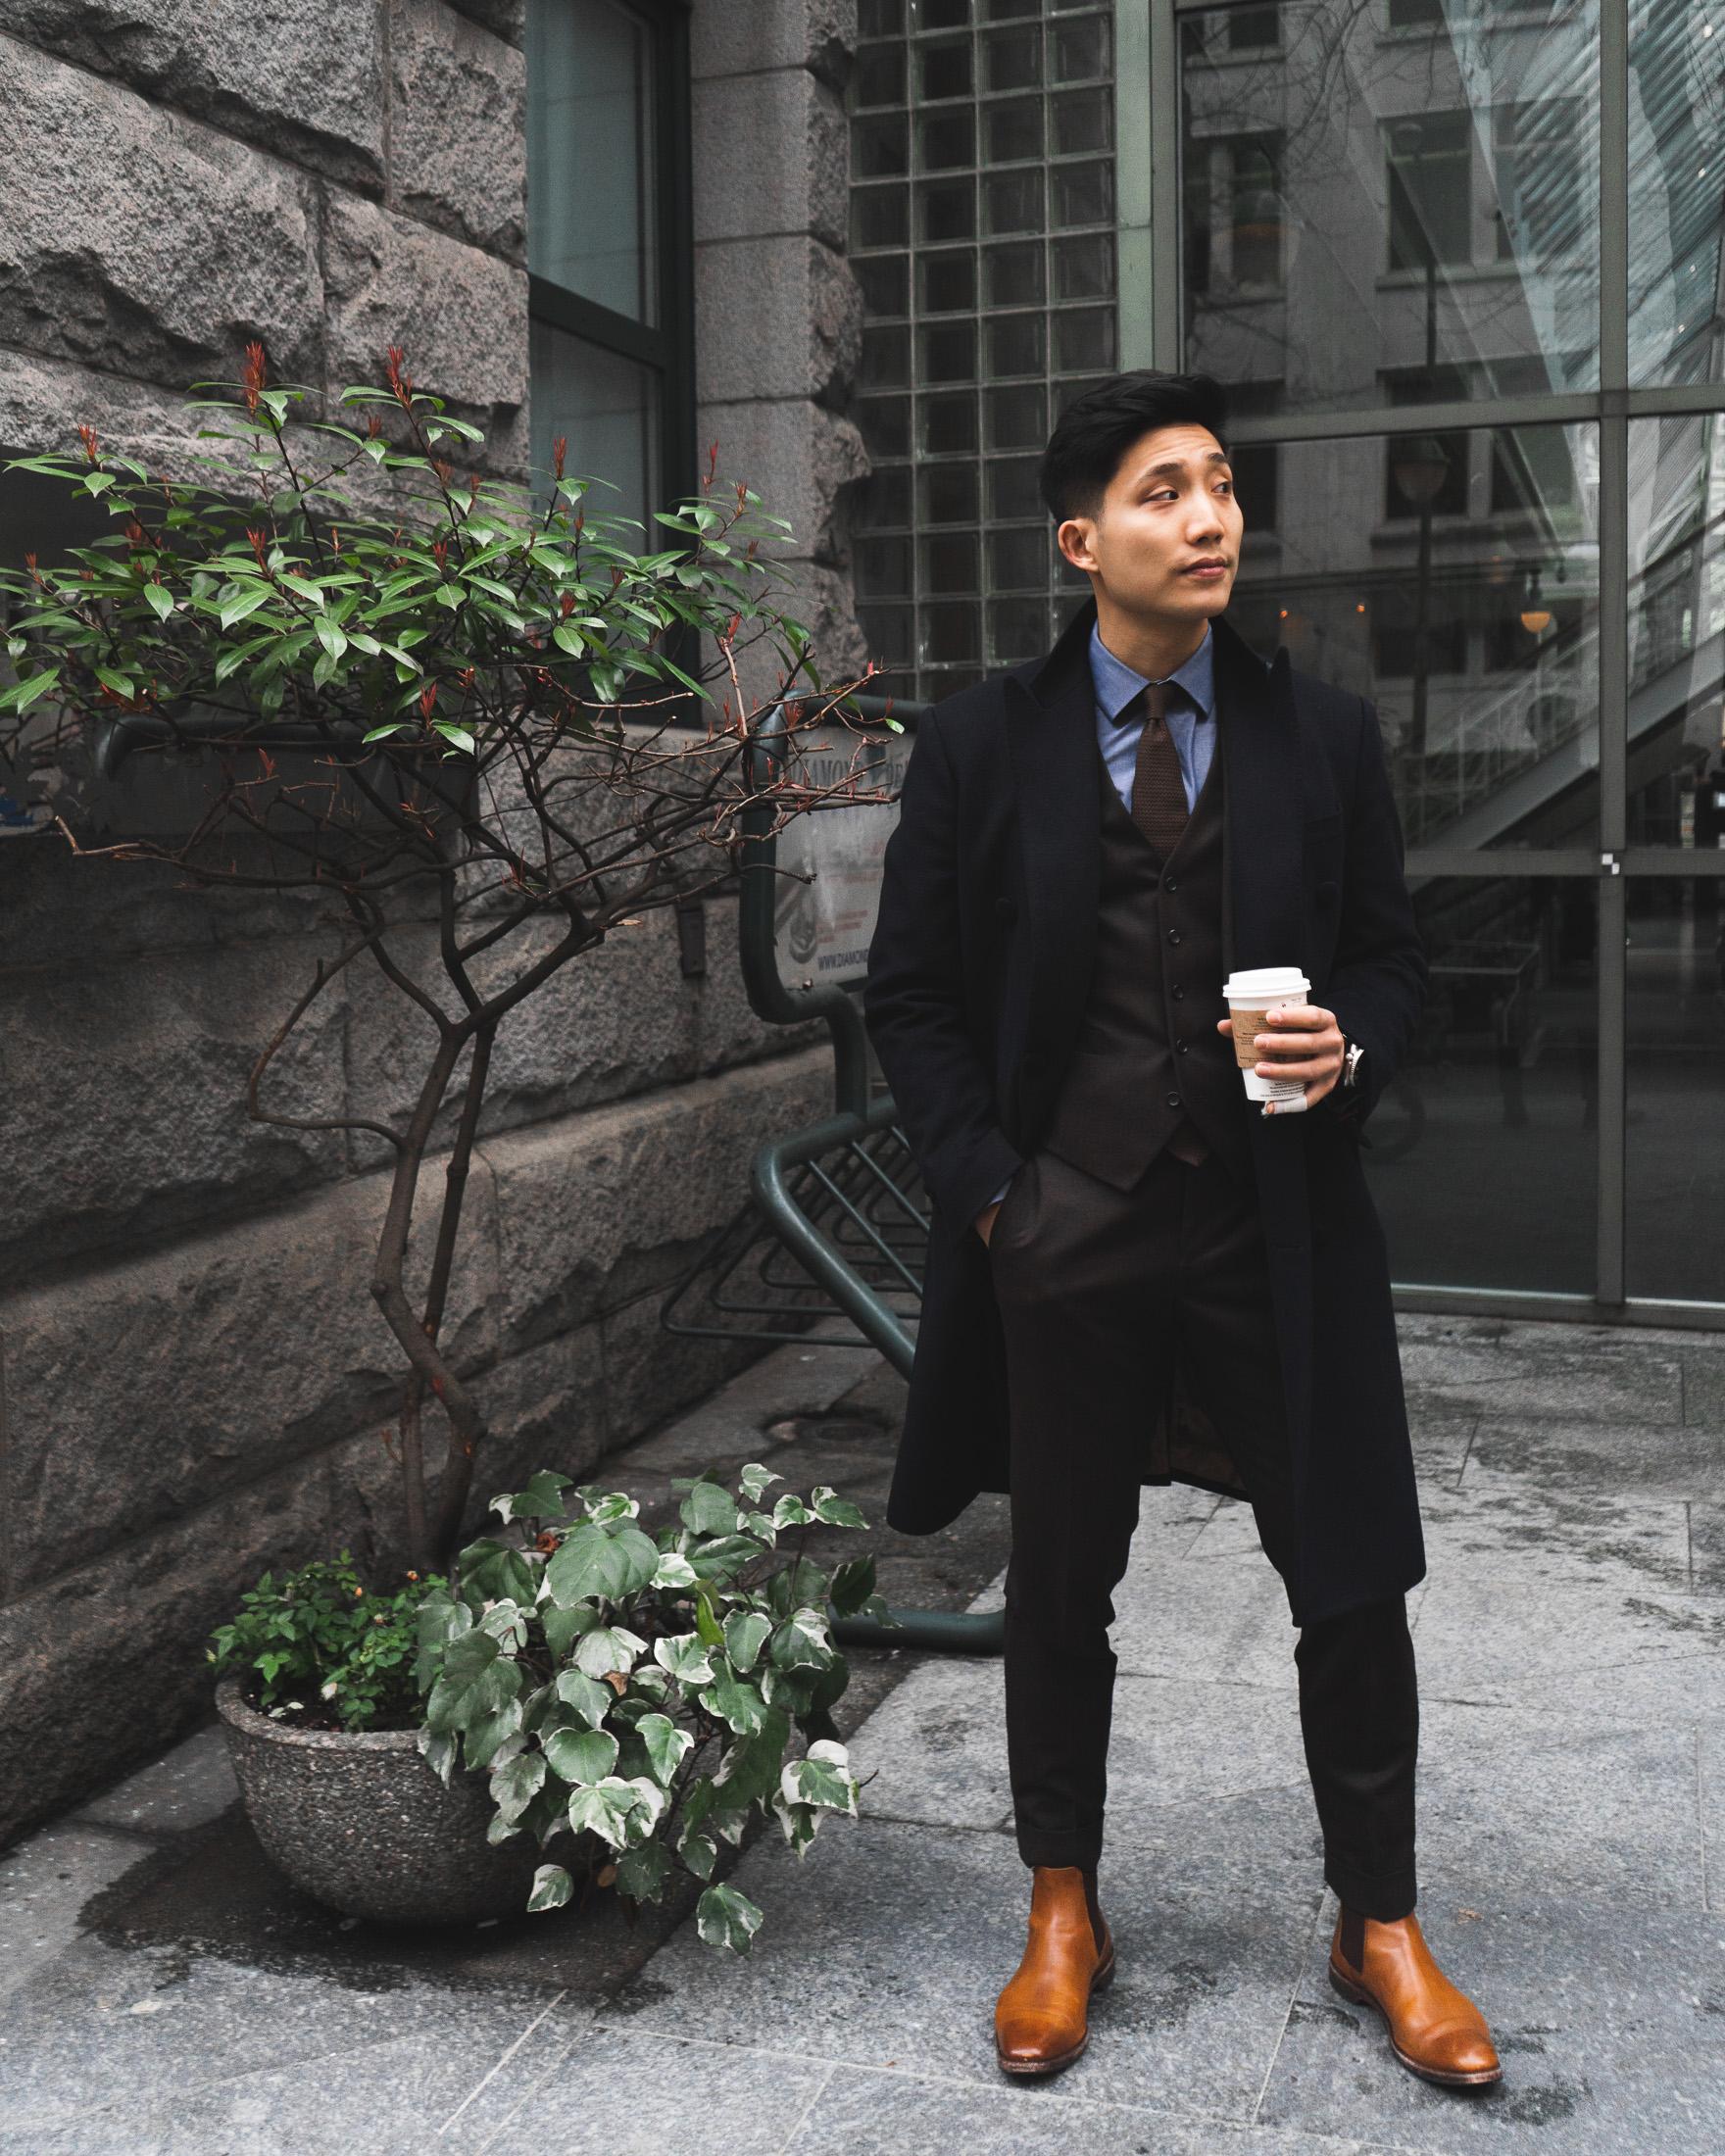 Garrison-bespoke-custom-brown-flannel-suit-navy-overcoat.jpg